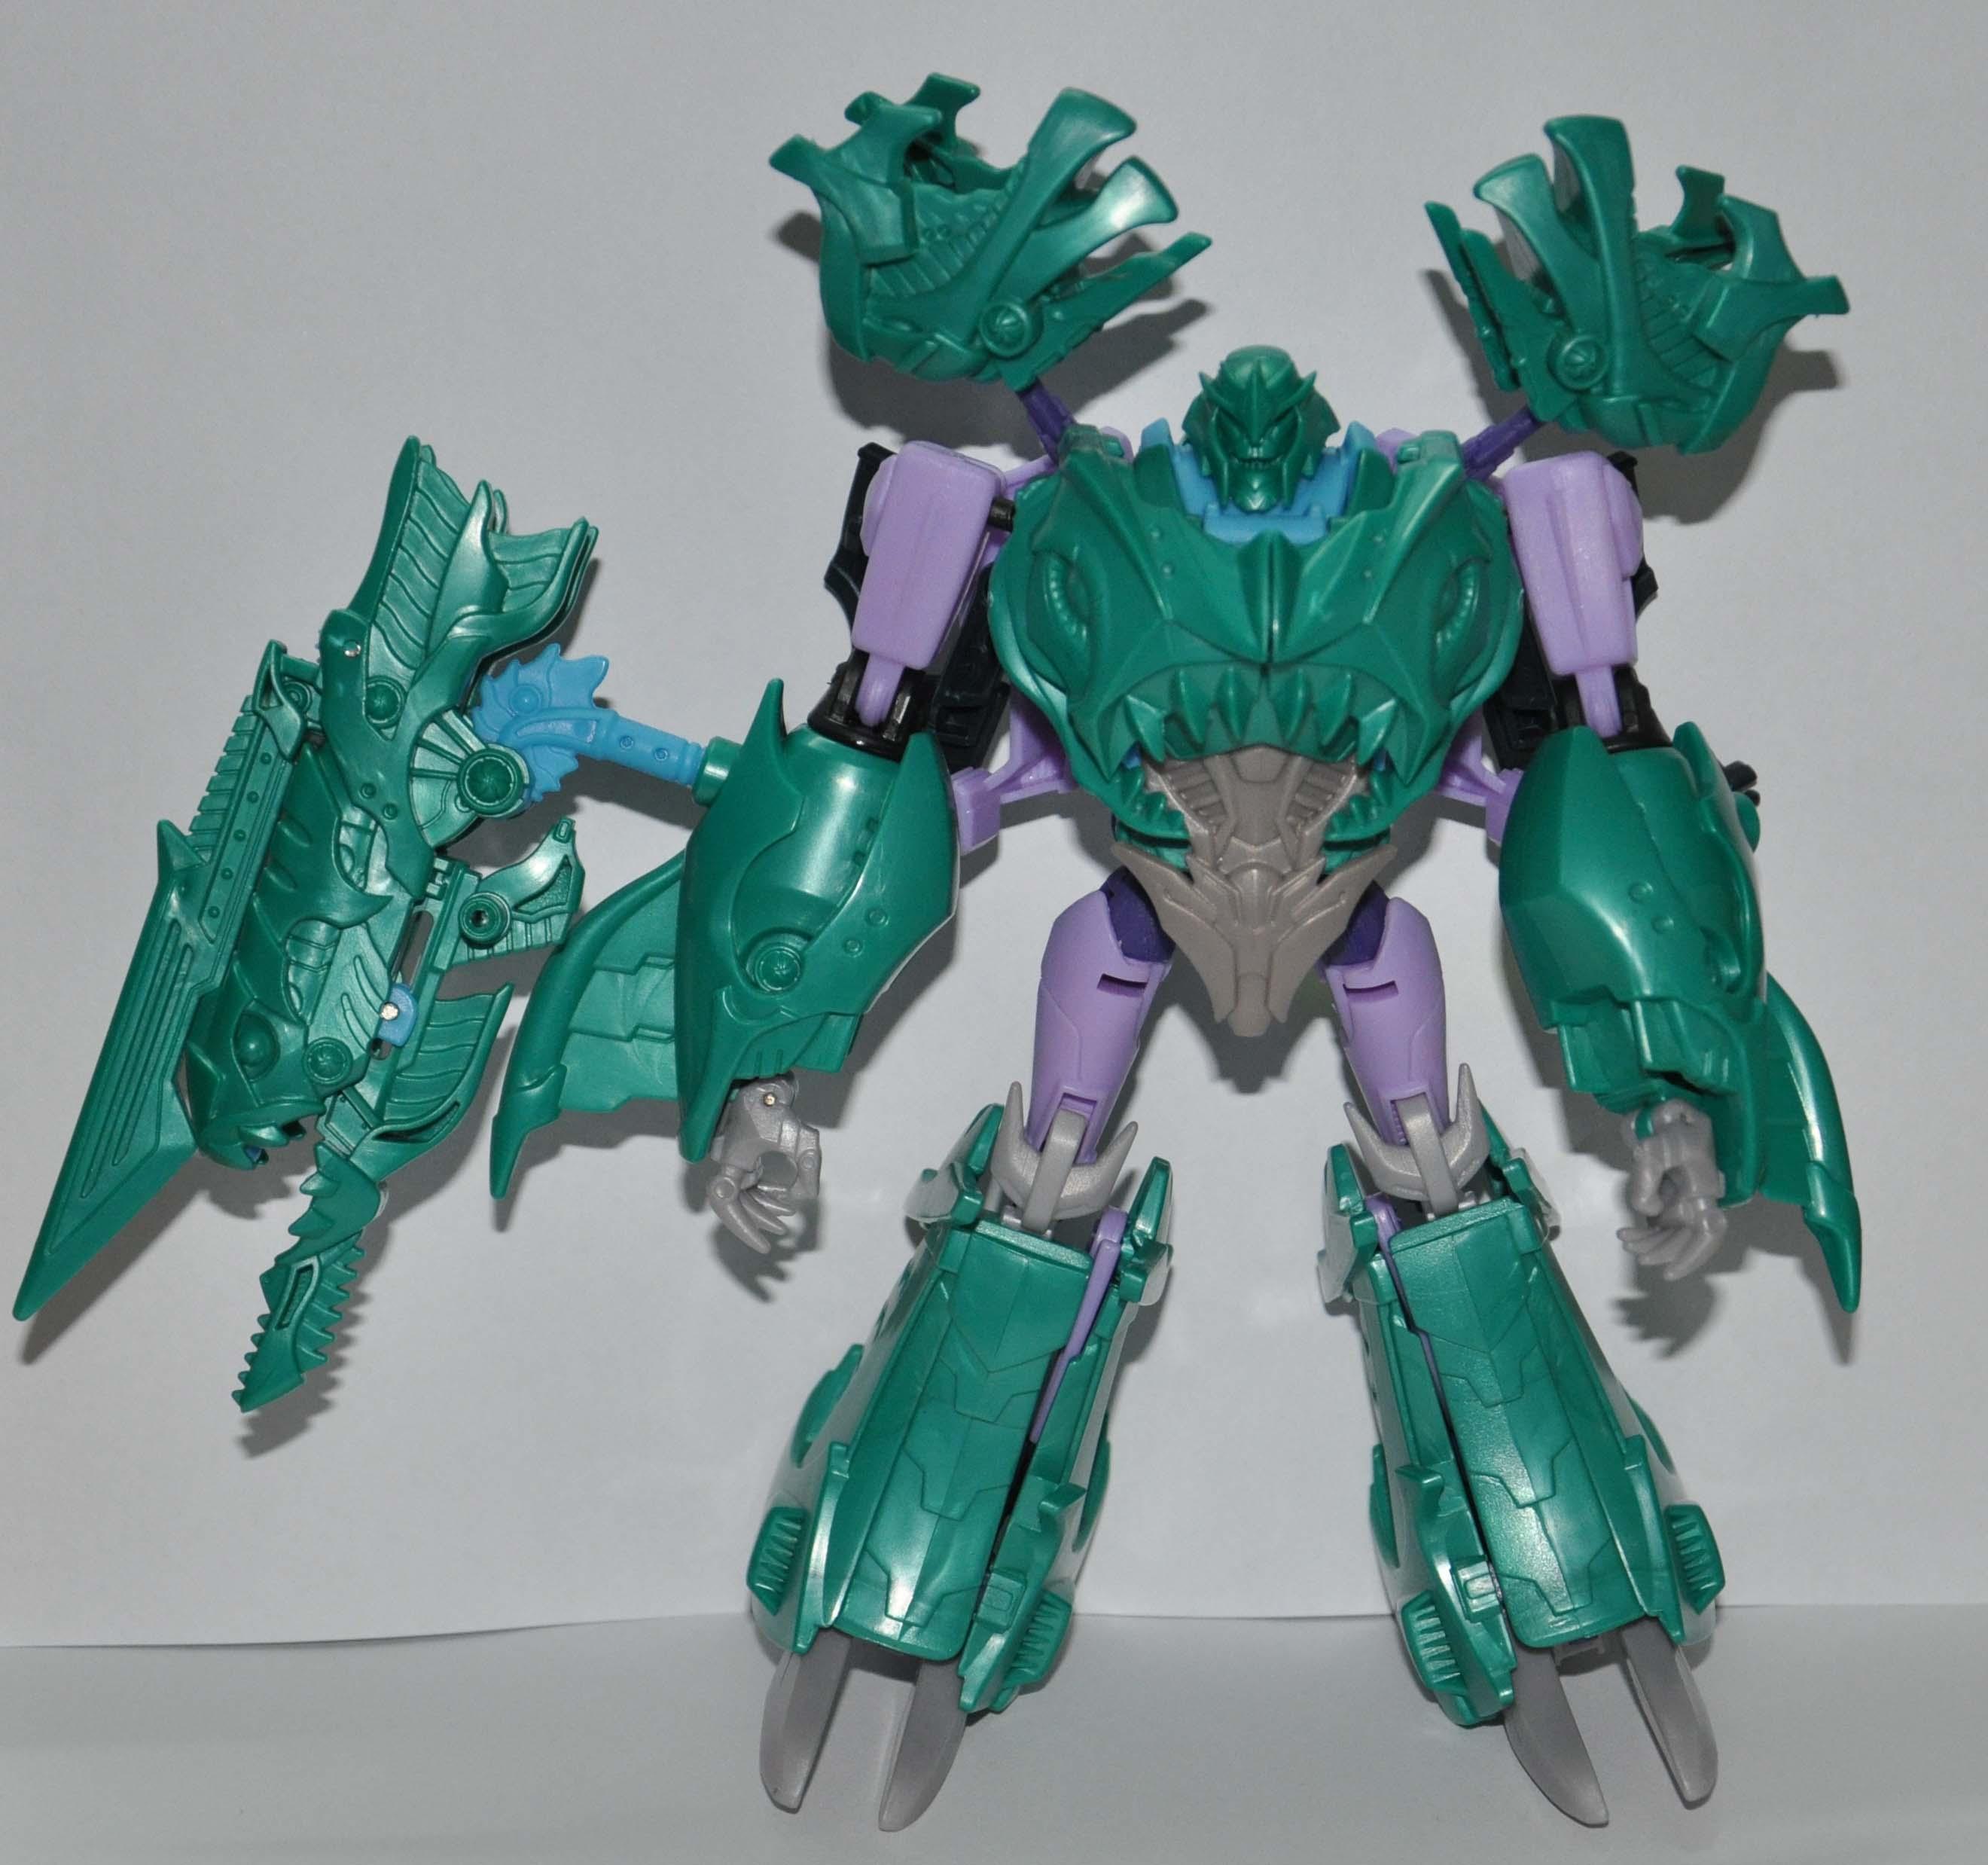 Transformers Prime Beast Hunters Megatron